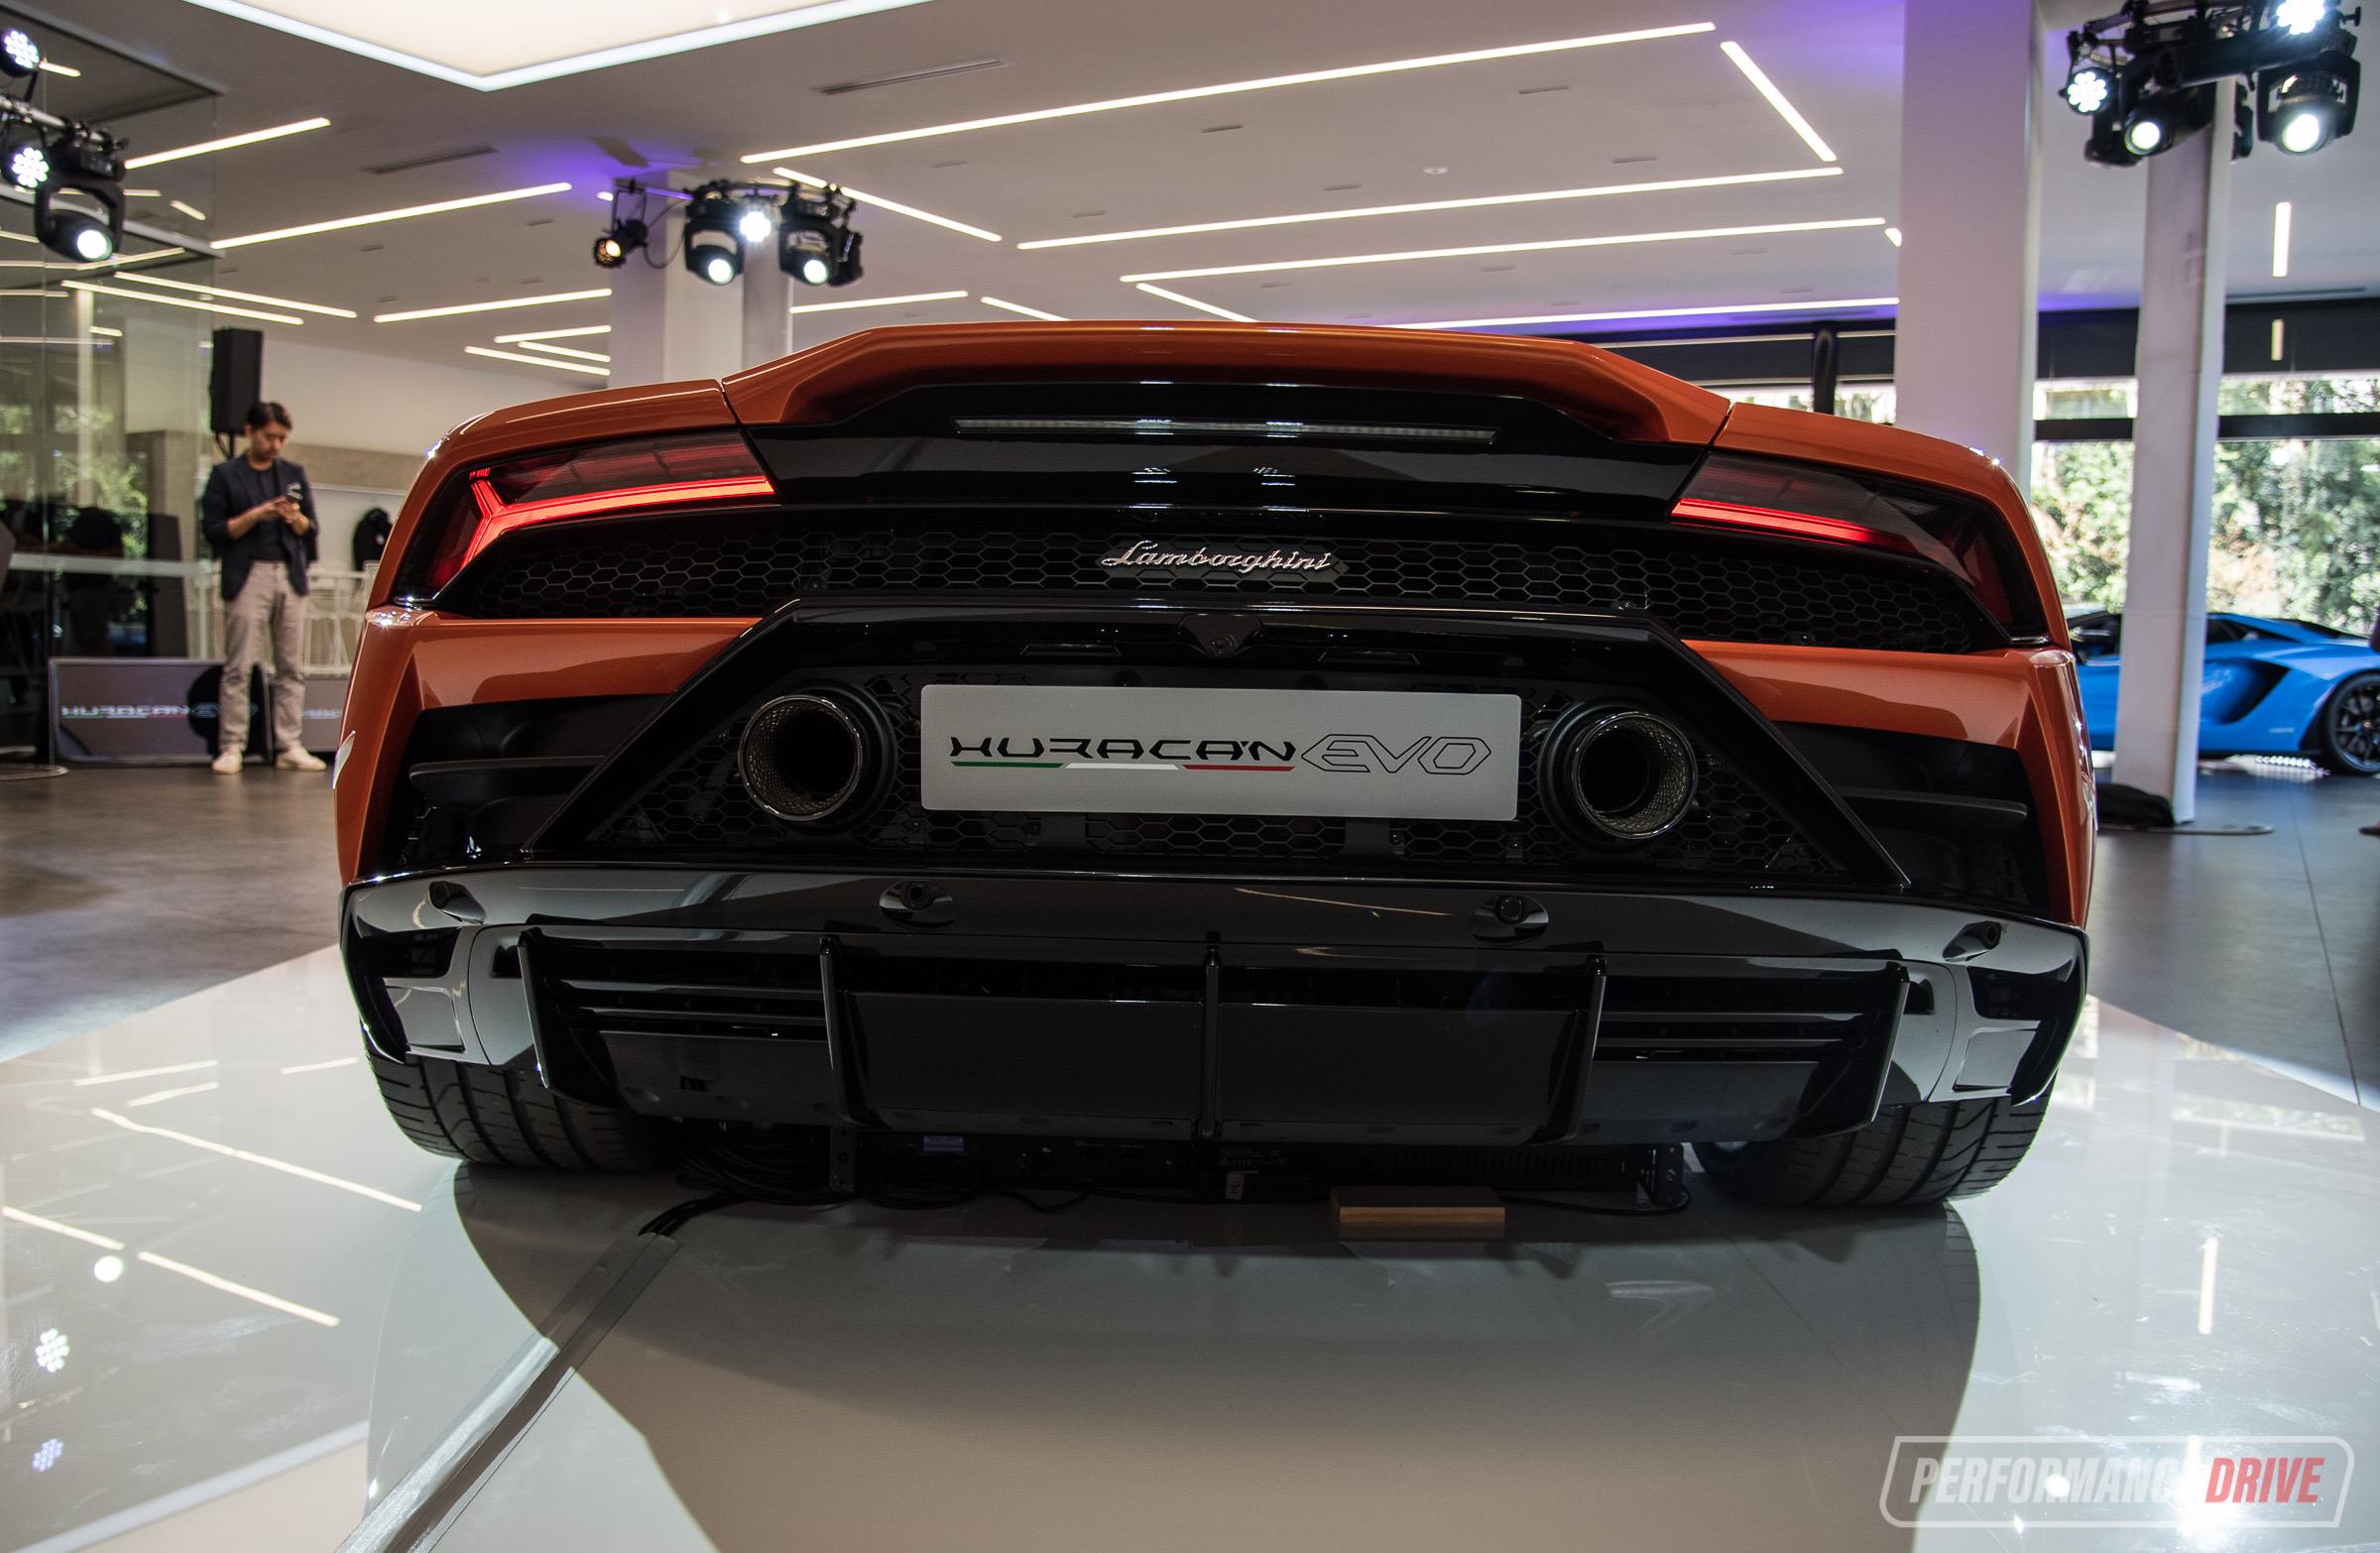 Lamborghini Huracan Evo Makes Australian Debut In Sydney